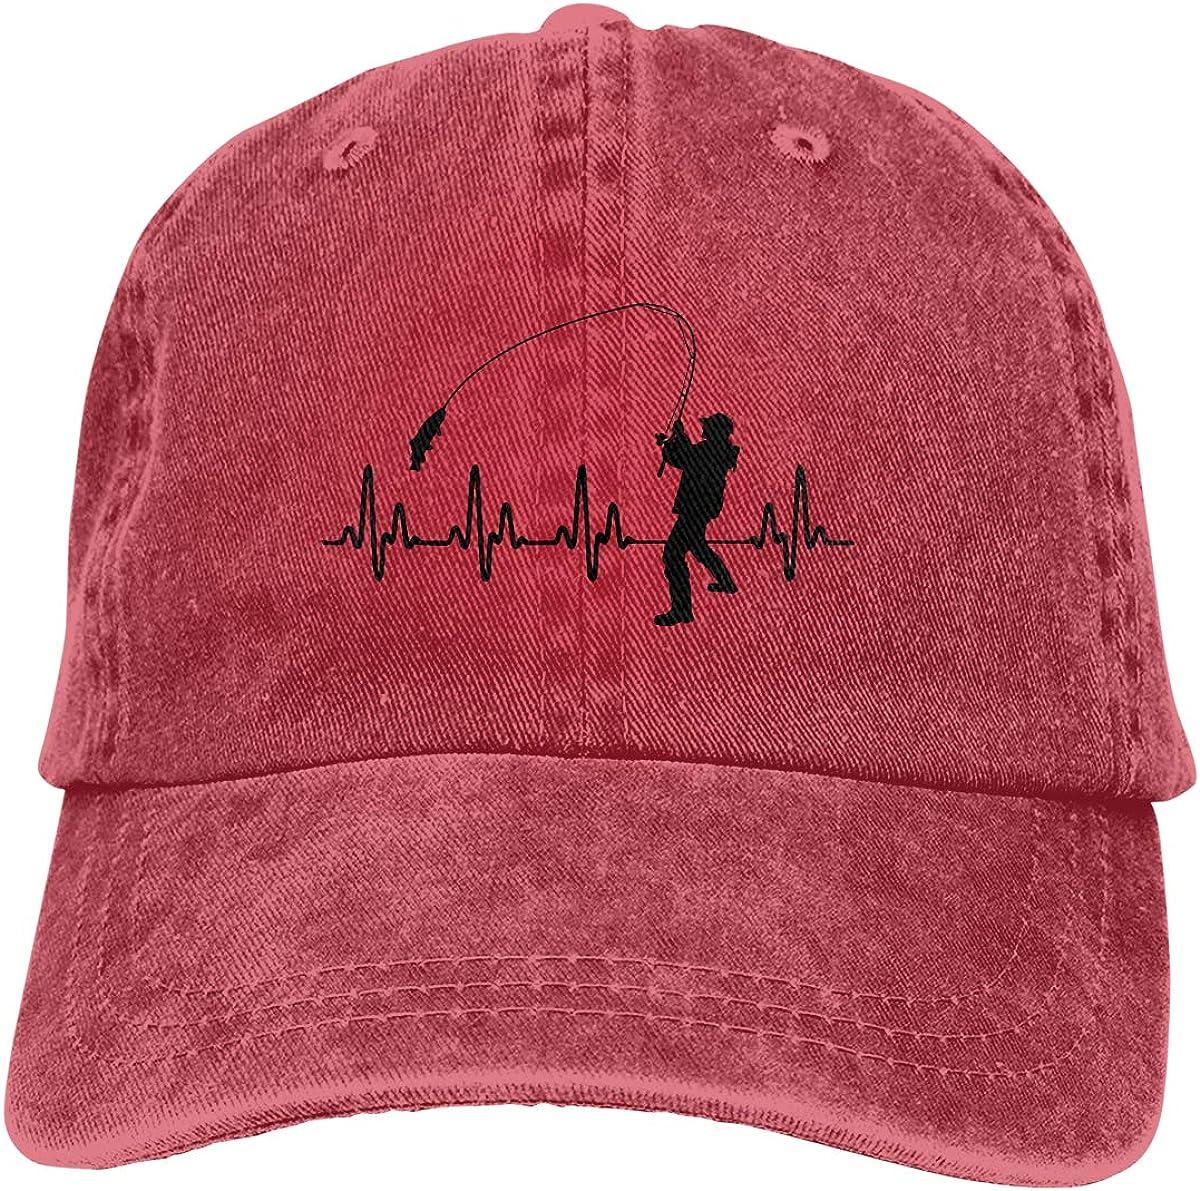 Heartbeat Fishing Denim Hat Adjustable Plain Cap Baseball Caps